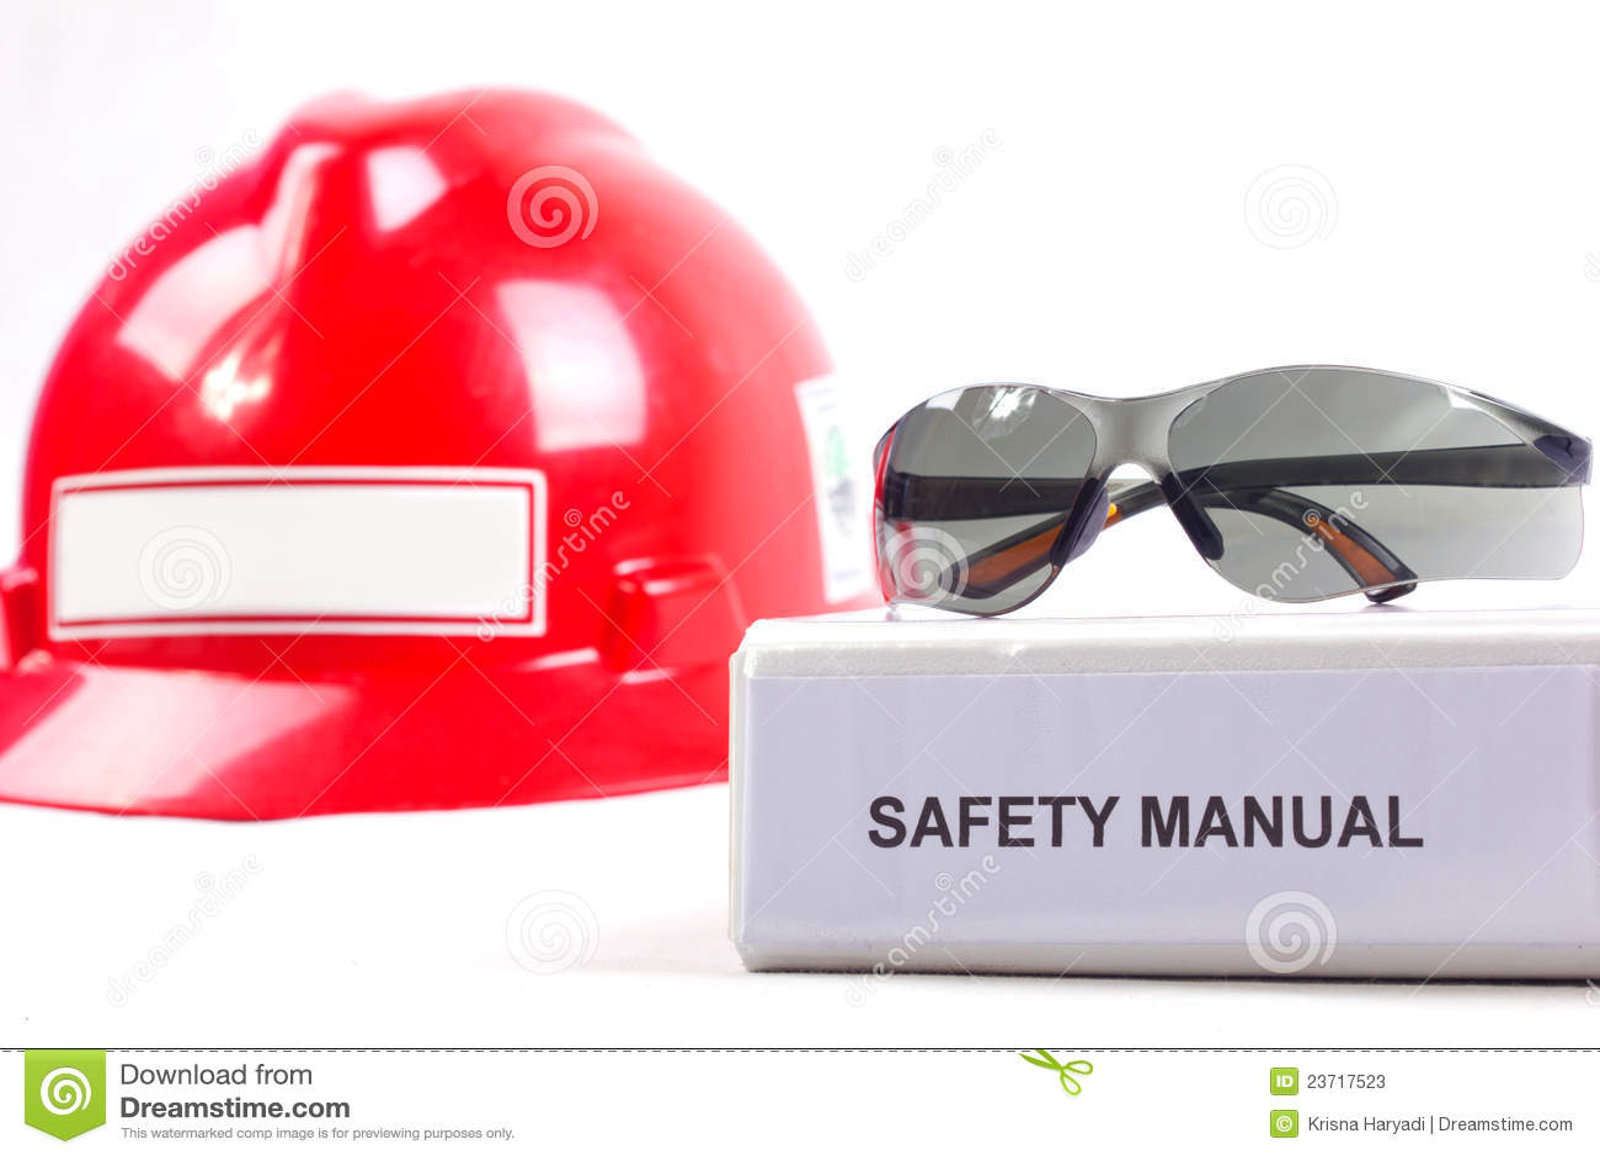 Safety Manual Photos Image 23717523 – Safety Manual